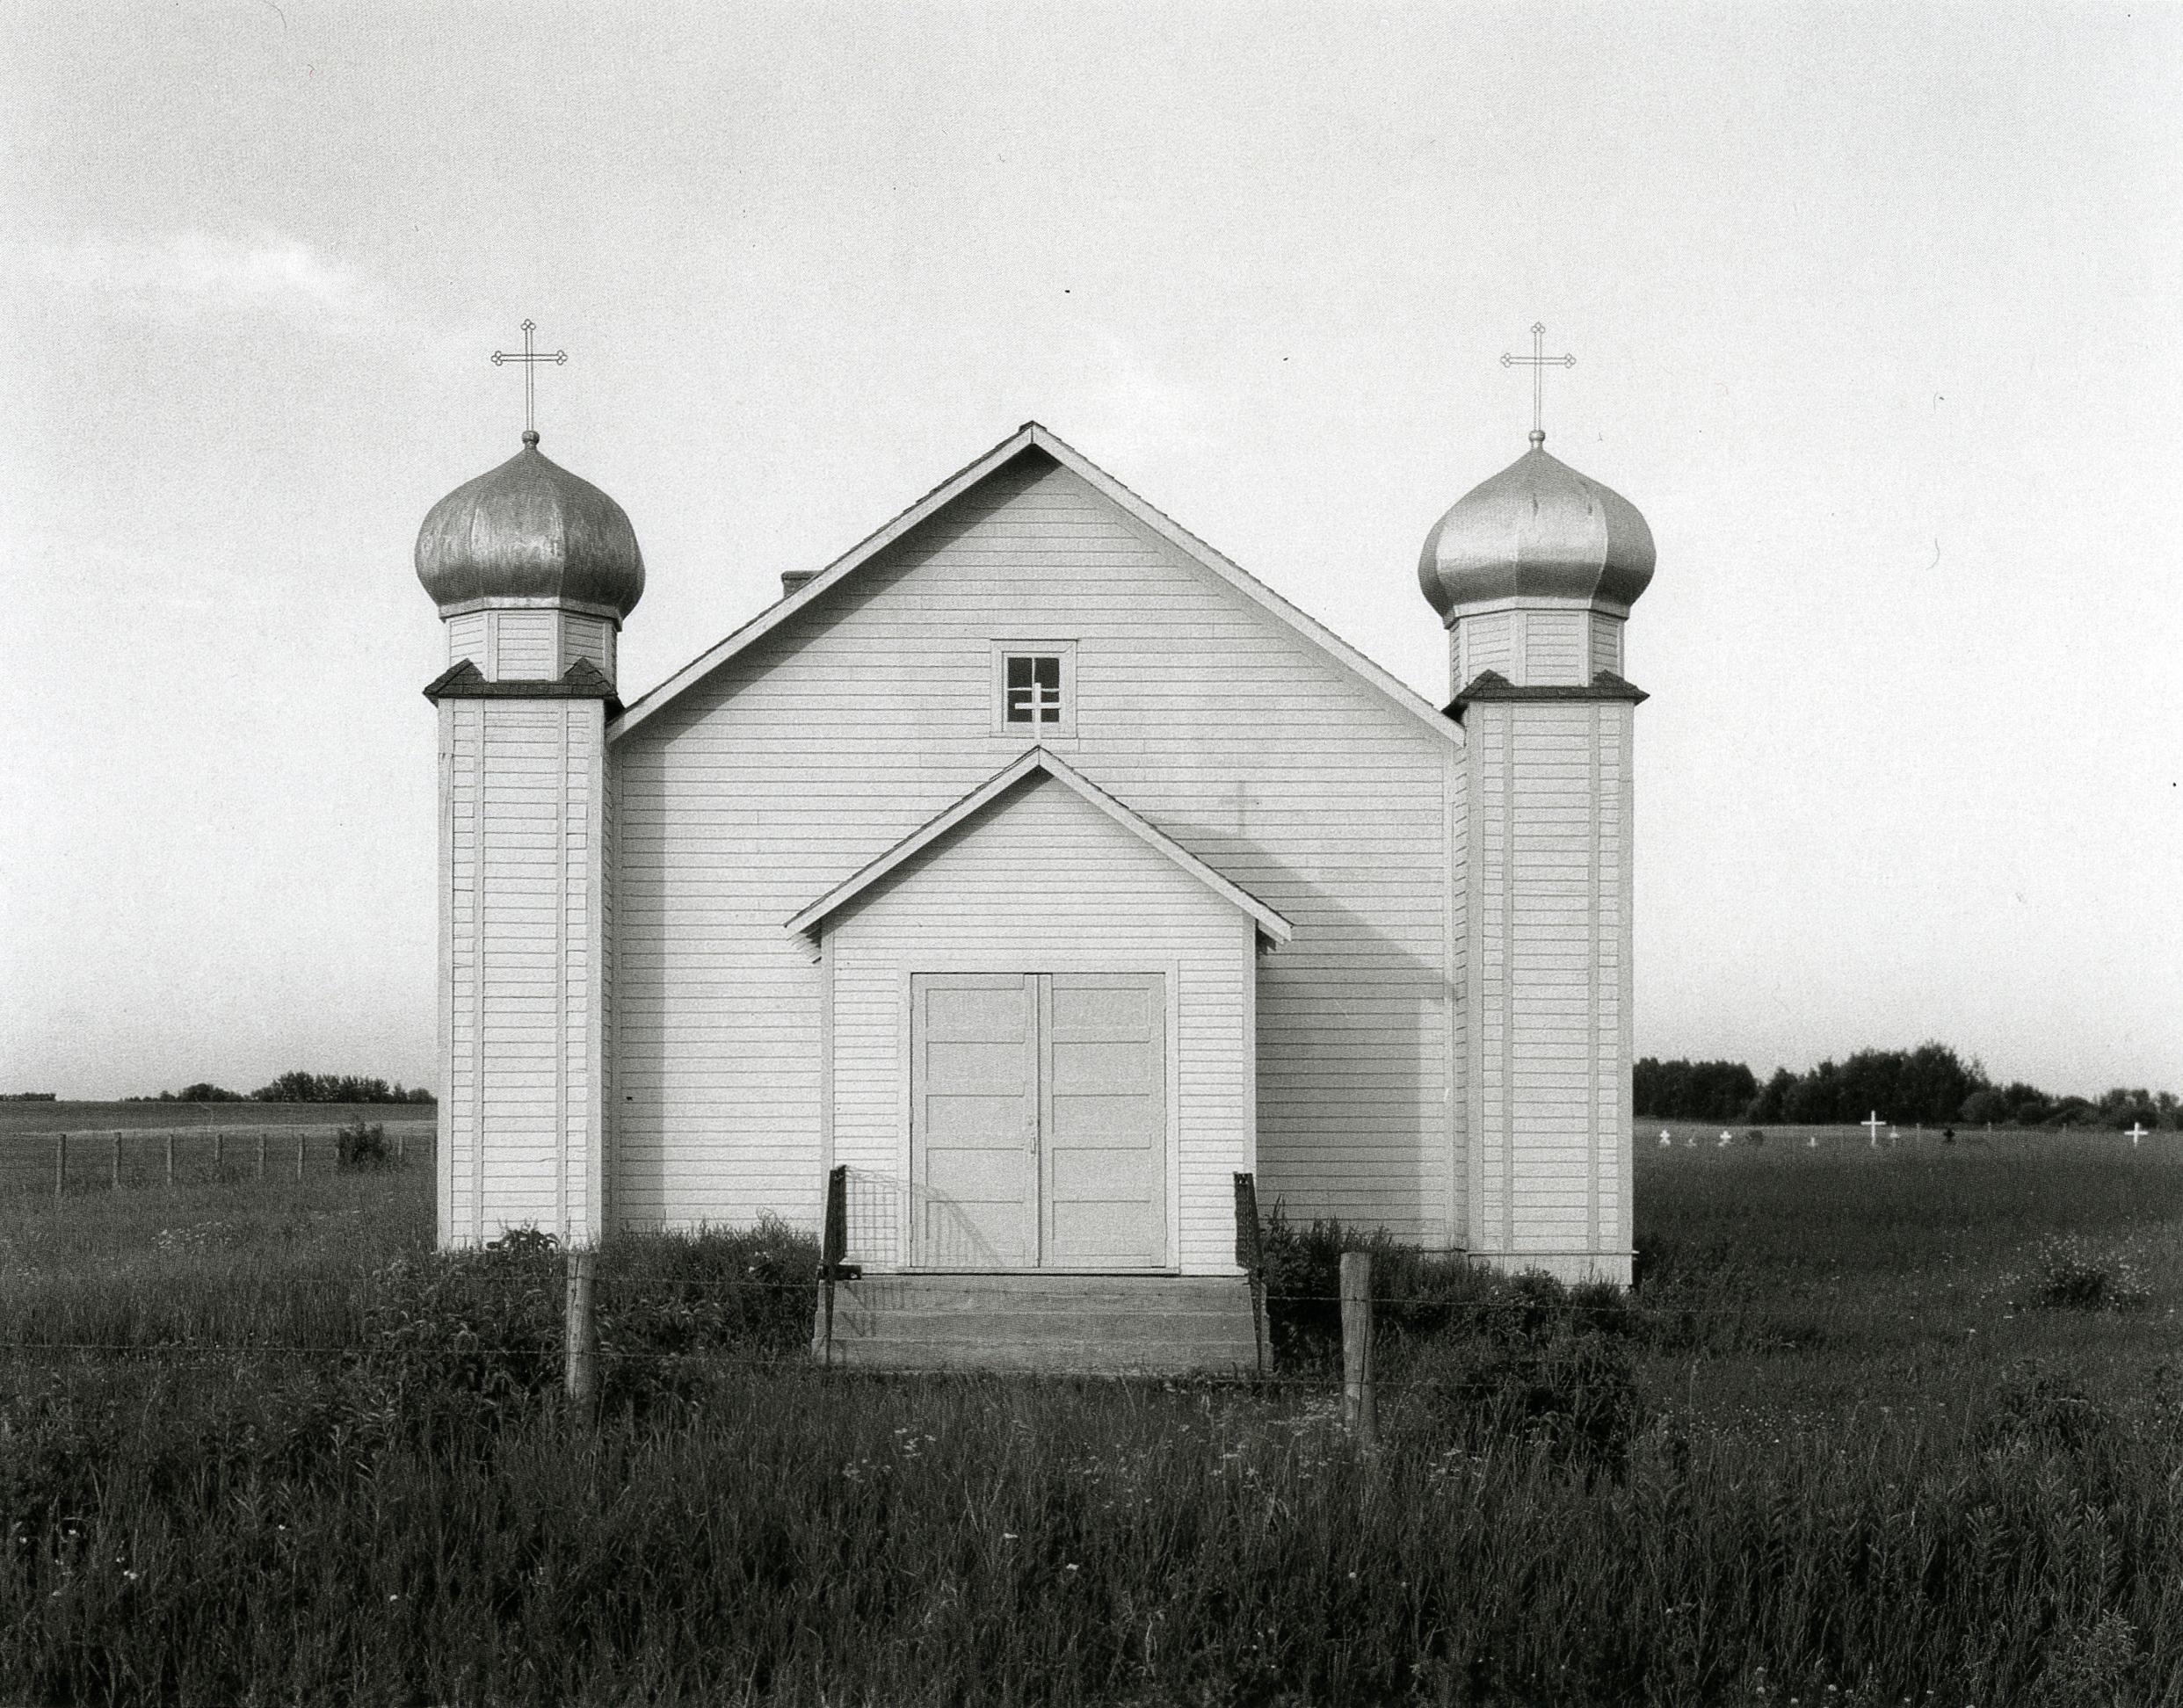 orest semchishen_église, Craigend, AB_1975